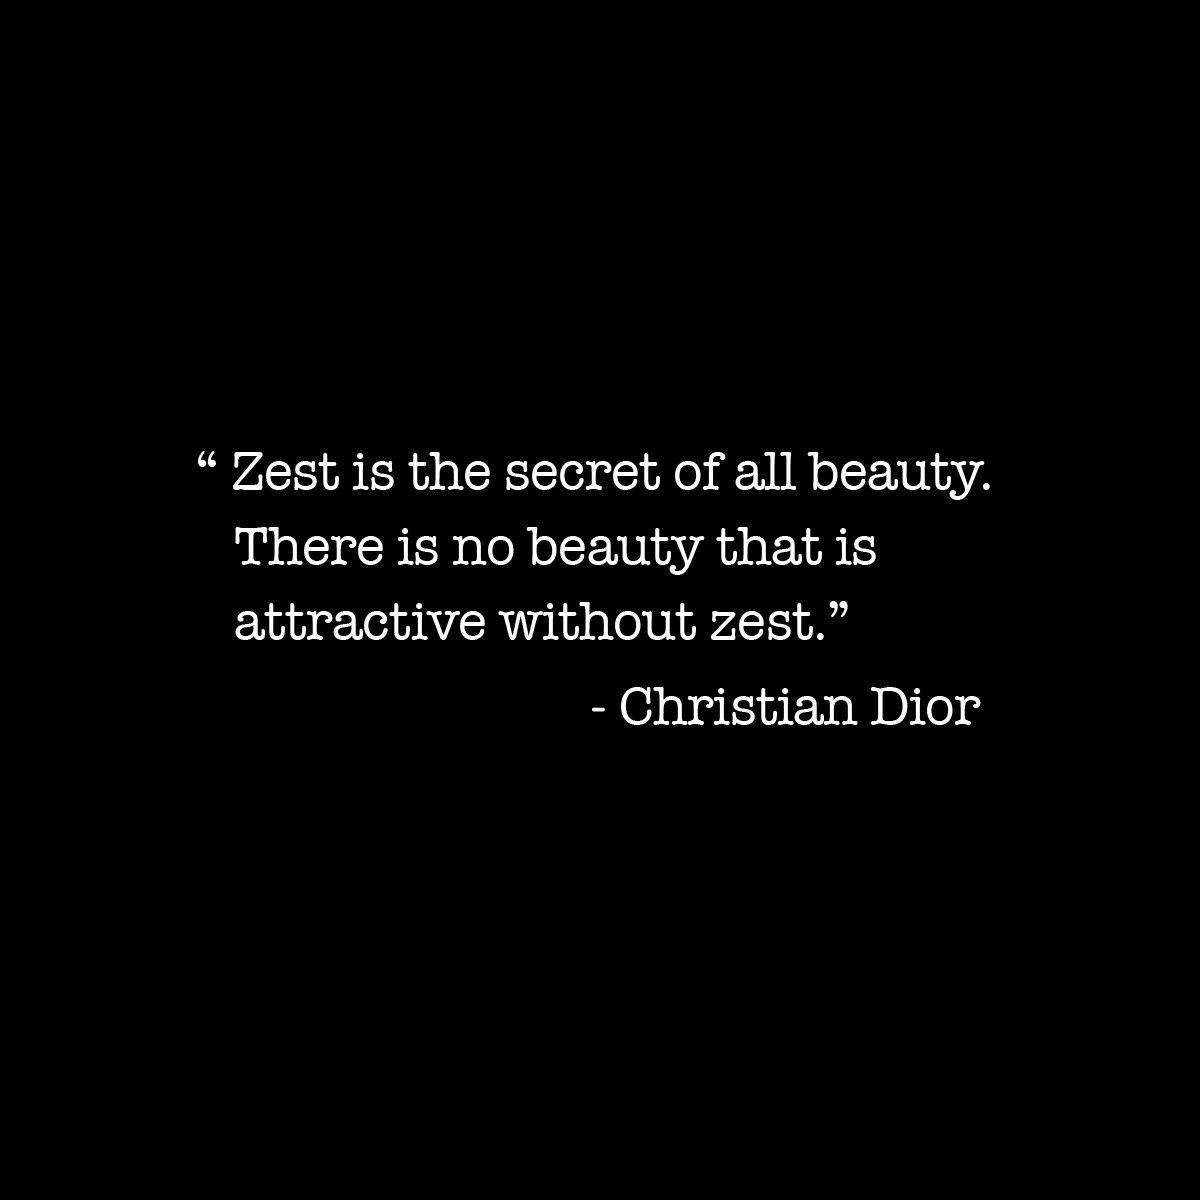 ChrisDior_Zest01.03.12